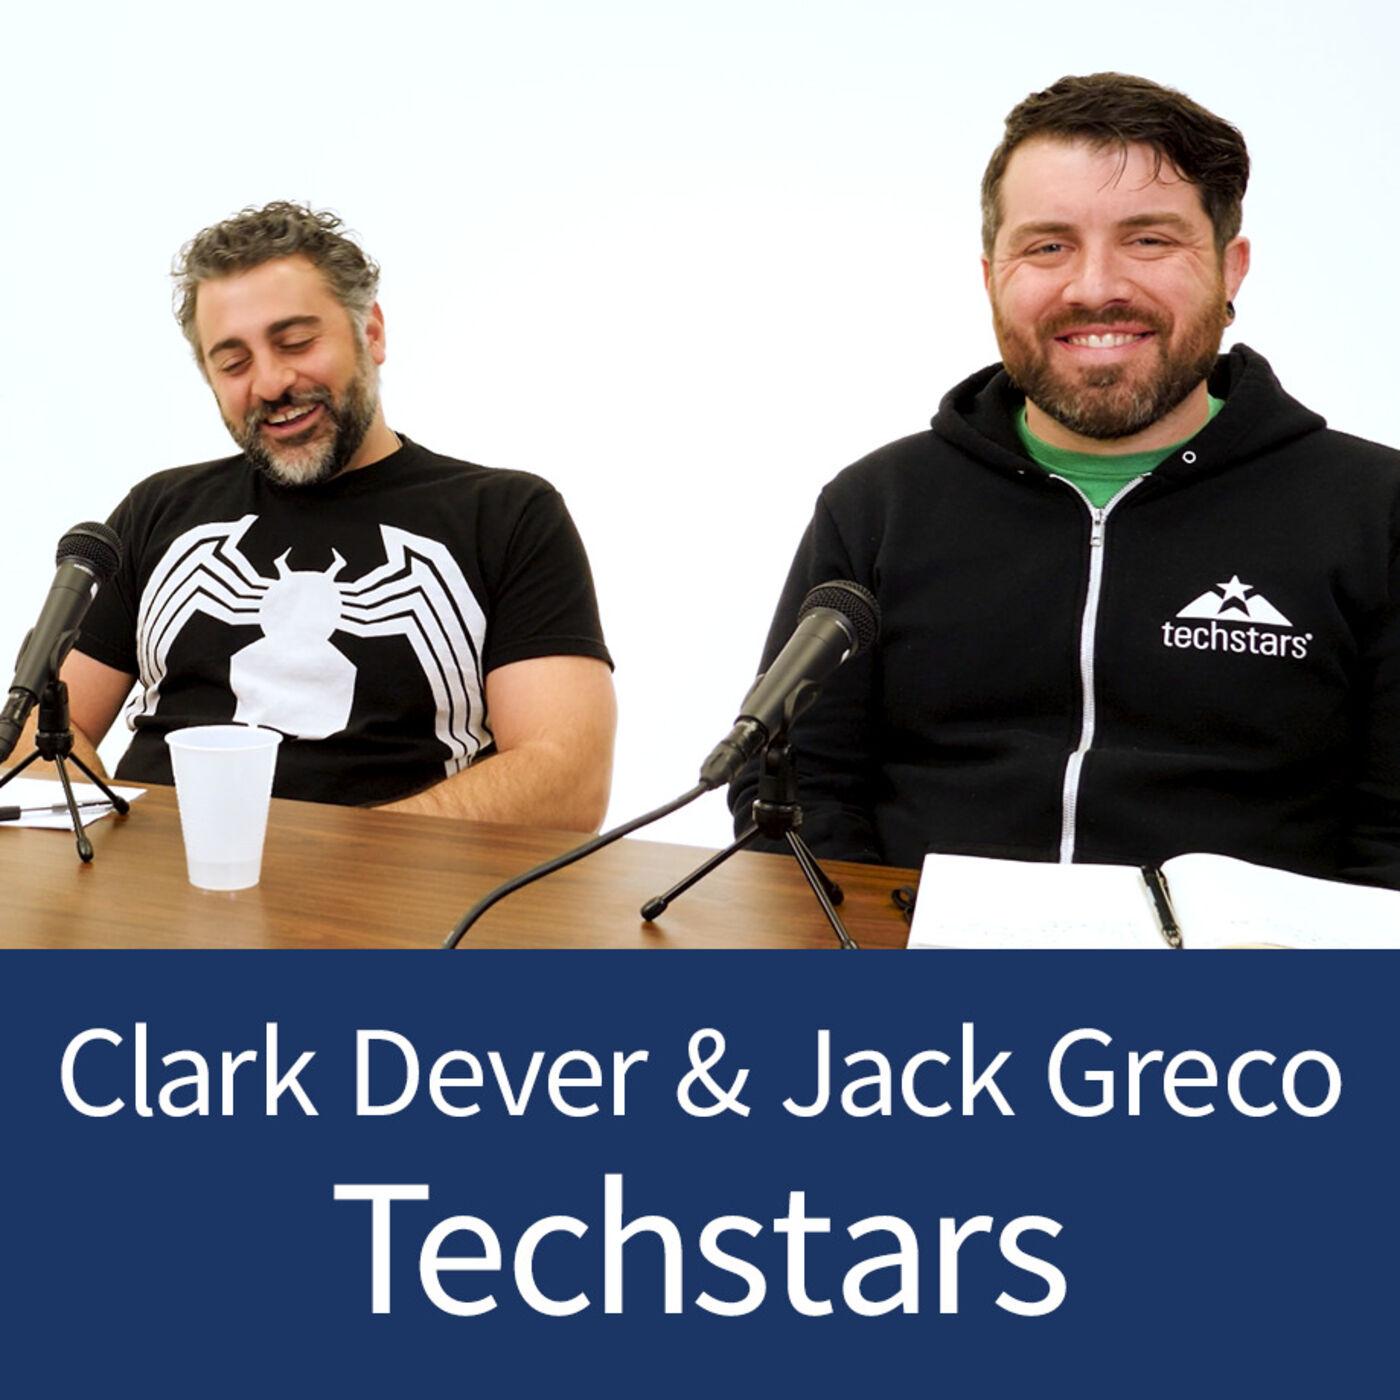 Clark Dever and Jack Greco - Techstars - Episode 15